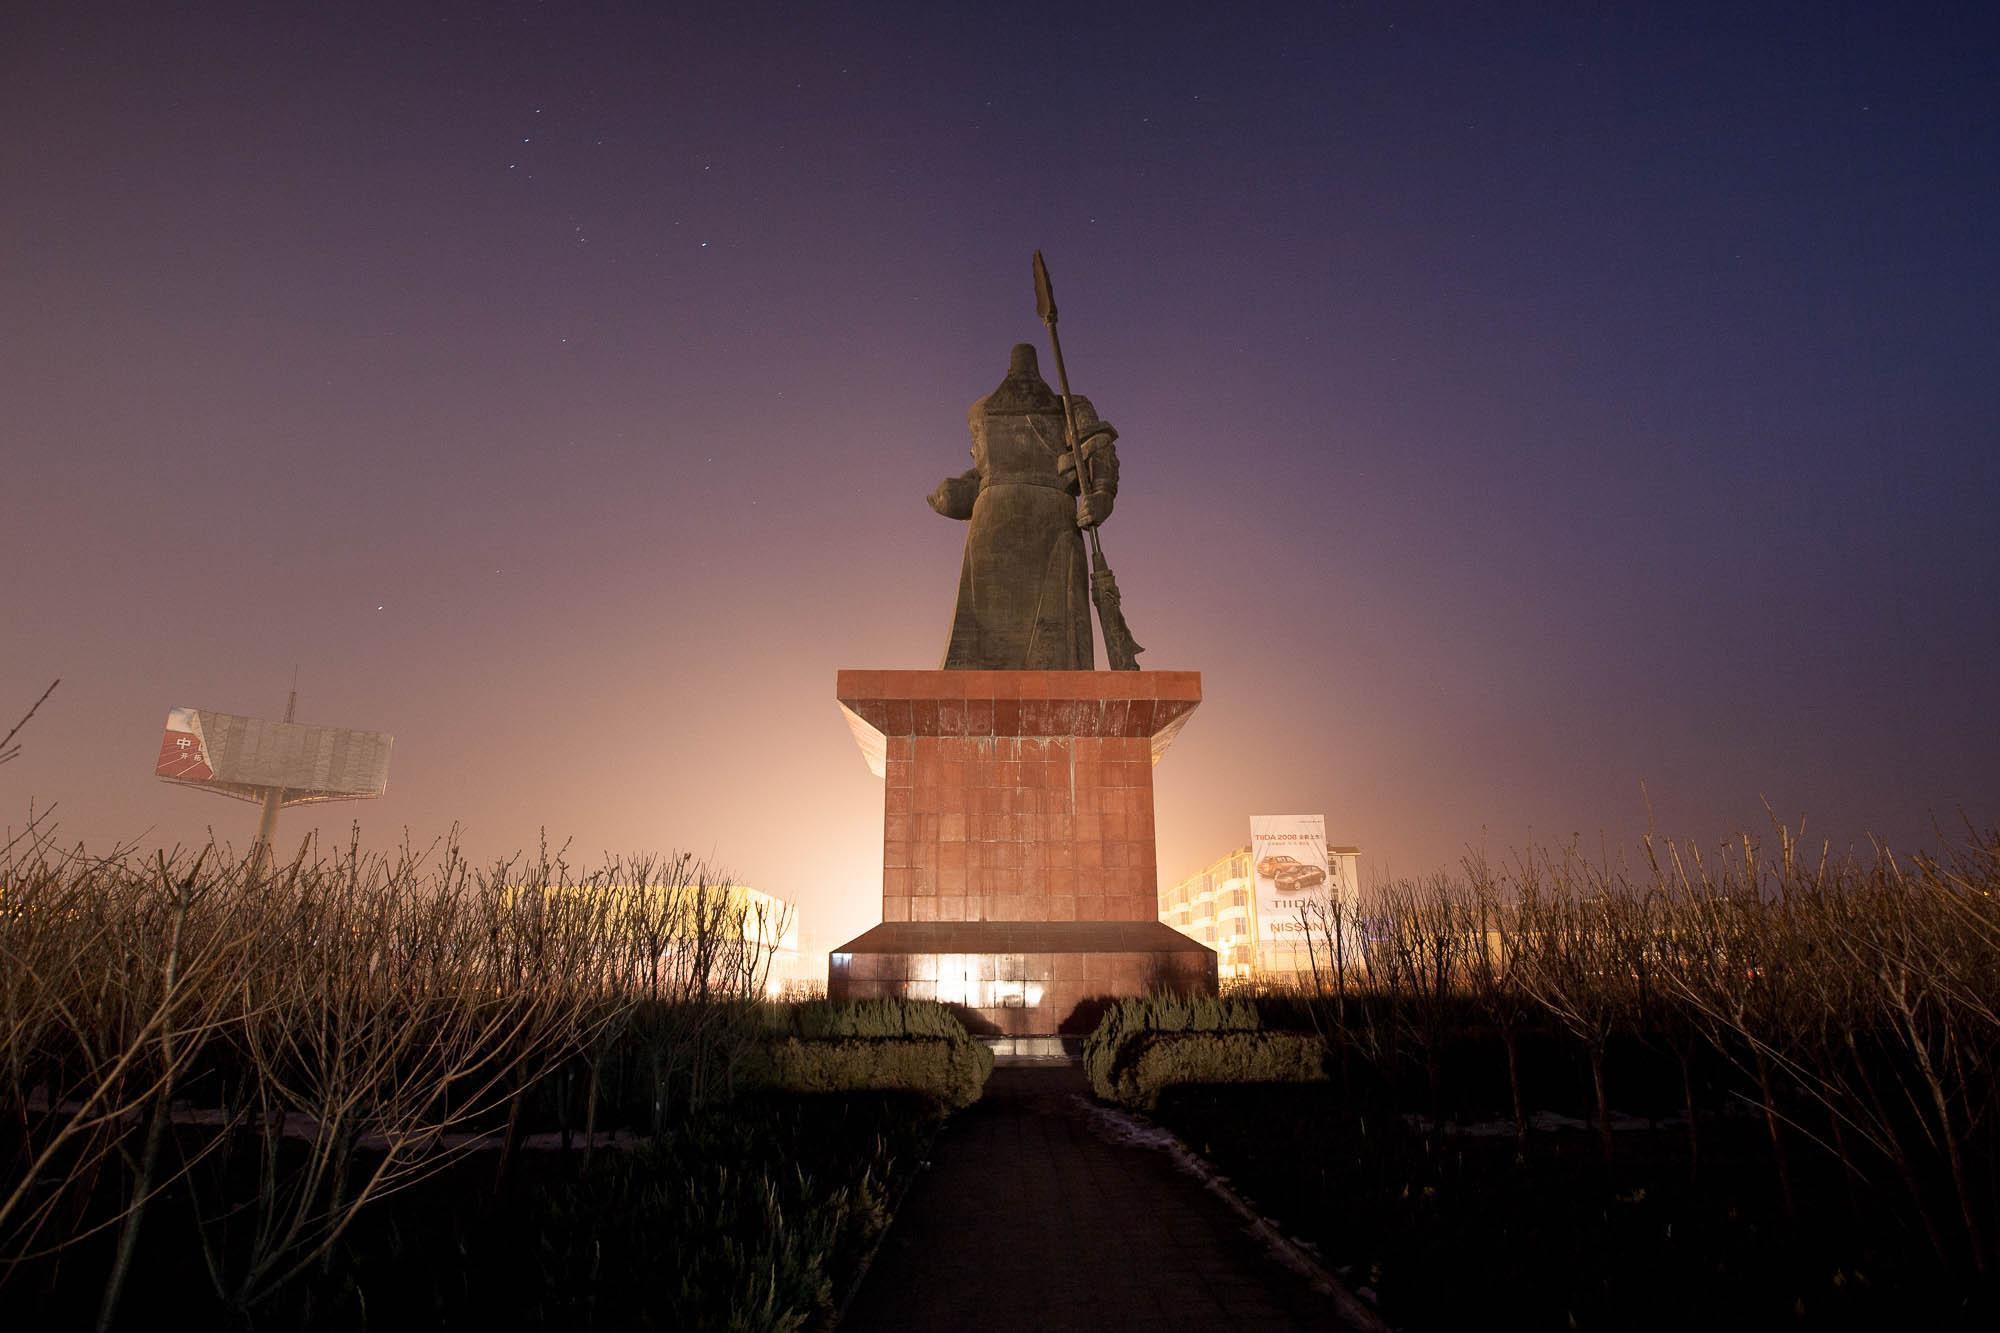 Guanyu statue